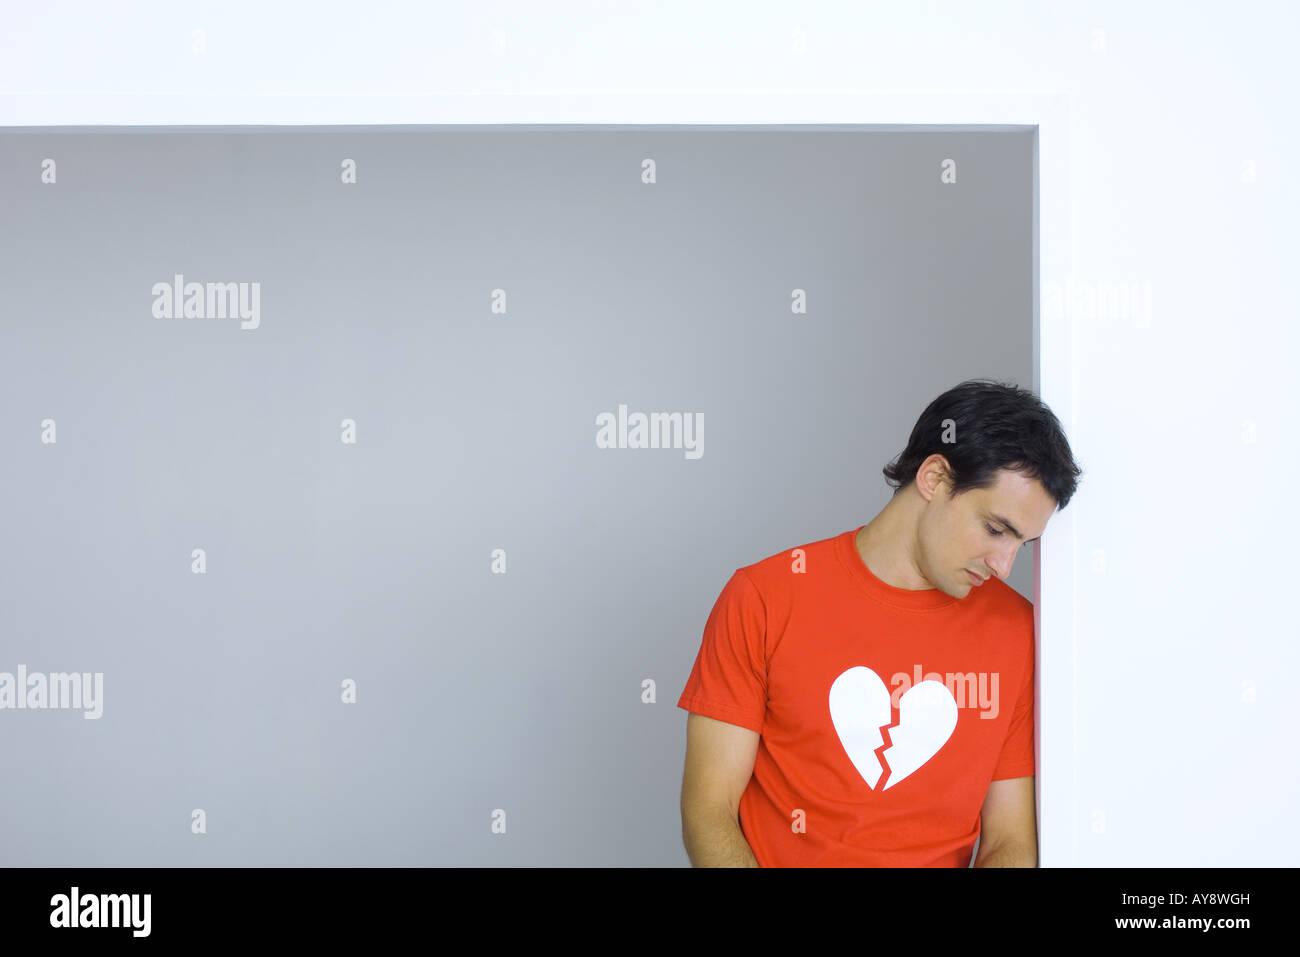 Man wearing tee-shirt with broken heart symbol, looking down - Stock Image